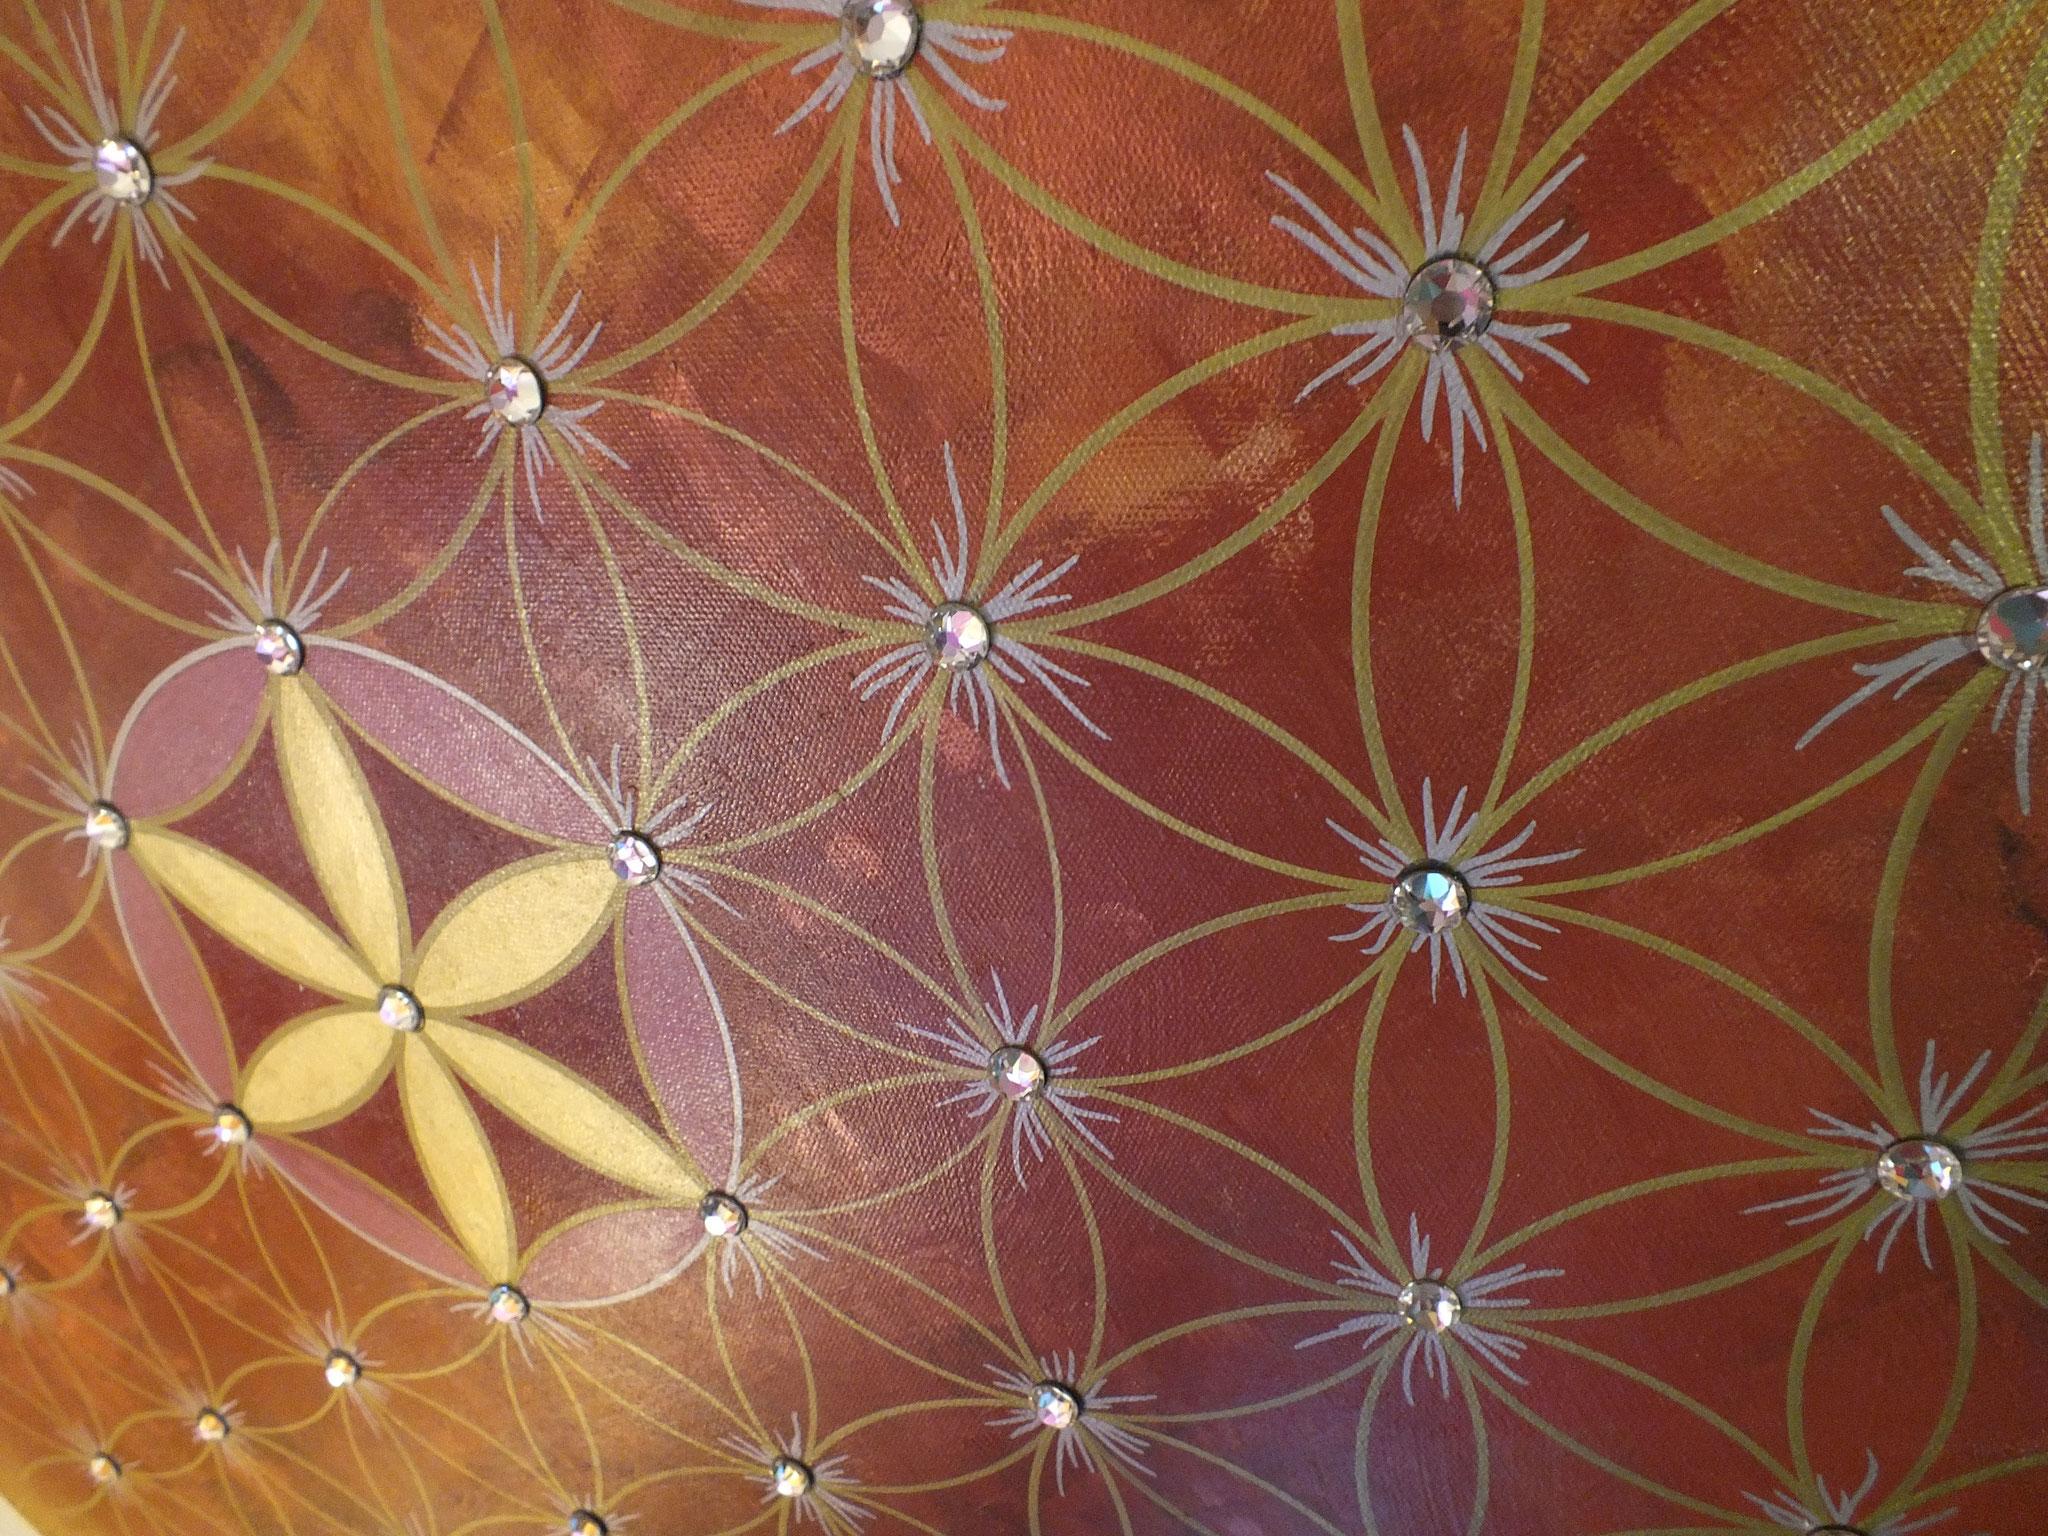 LIMITLESS Golden Flower of LOVE ... by Ramon Labusch * www.Stargate.international